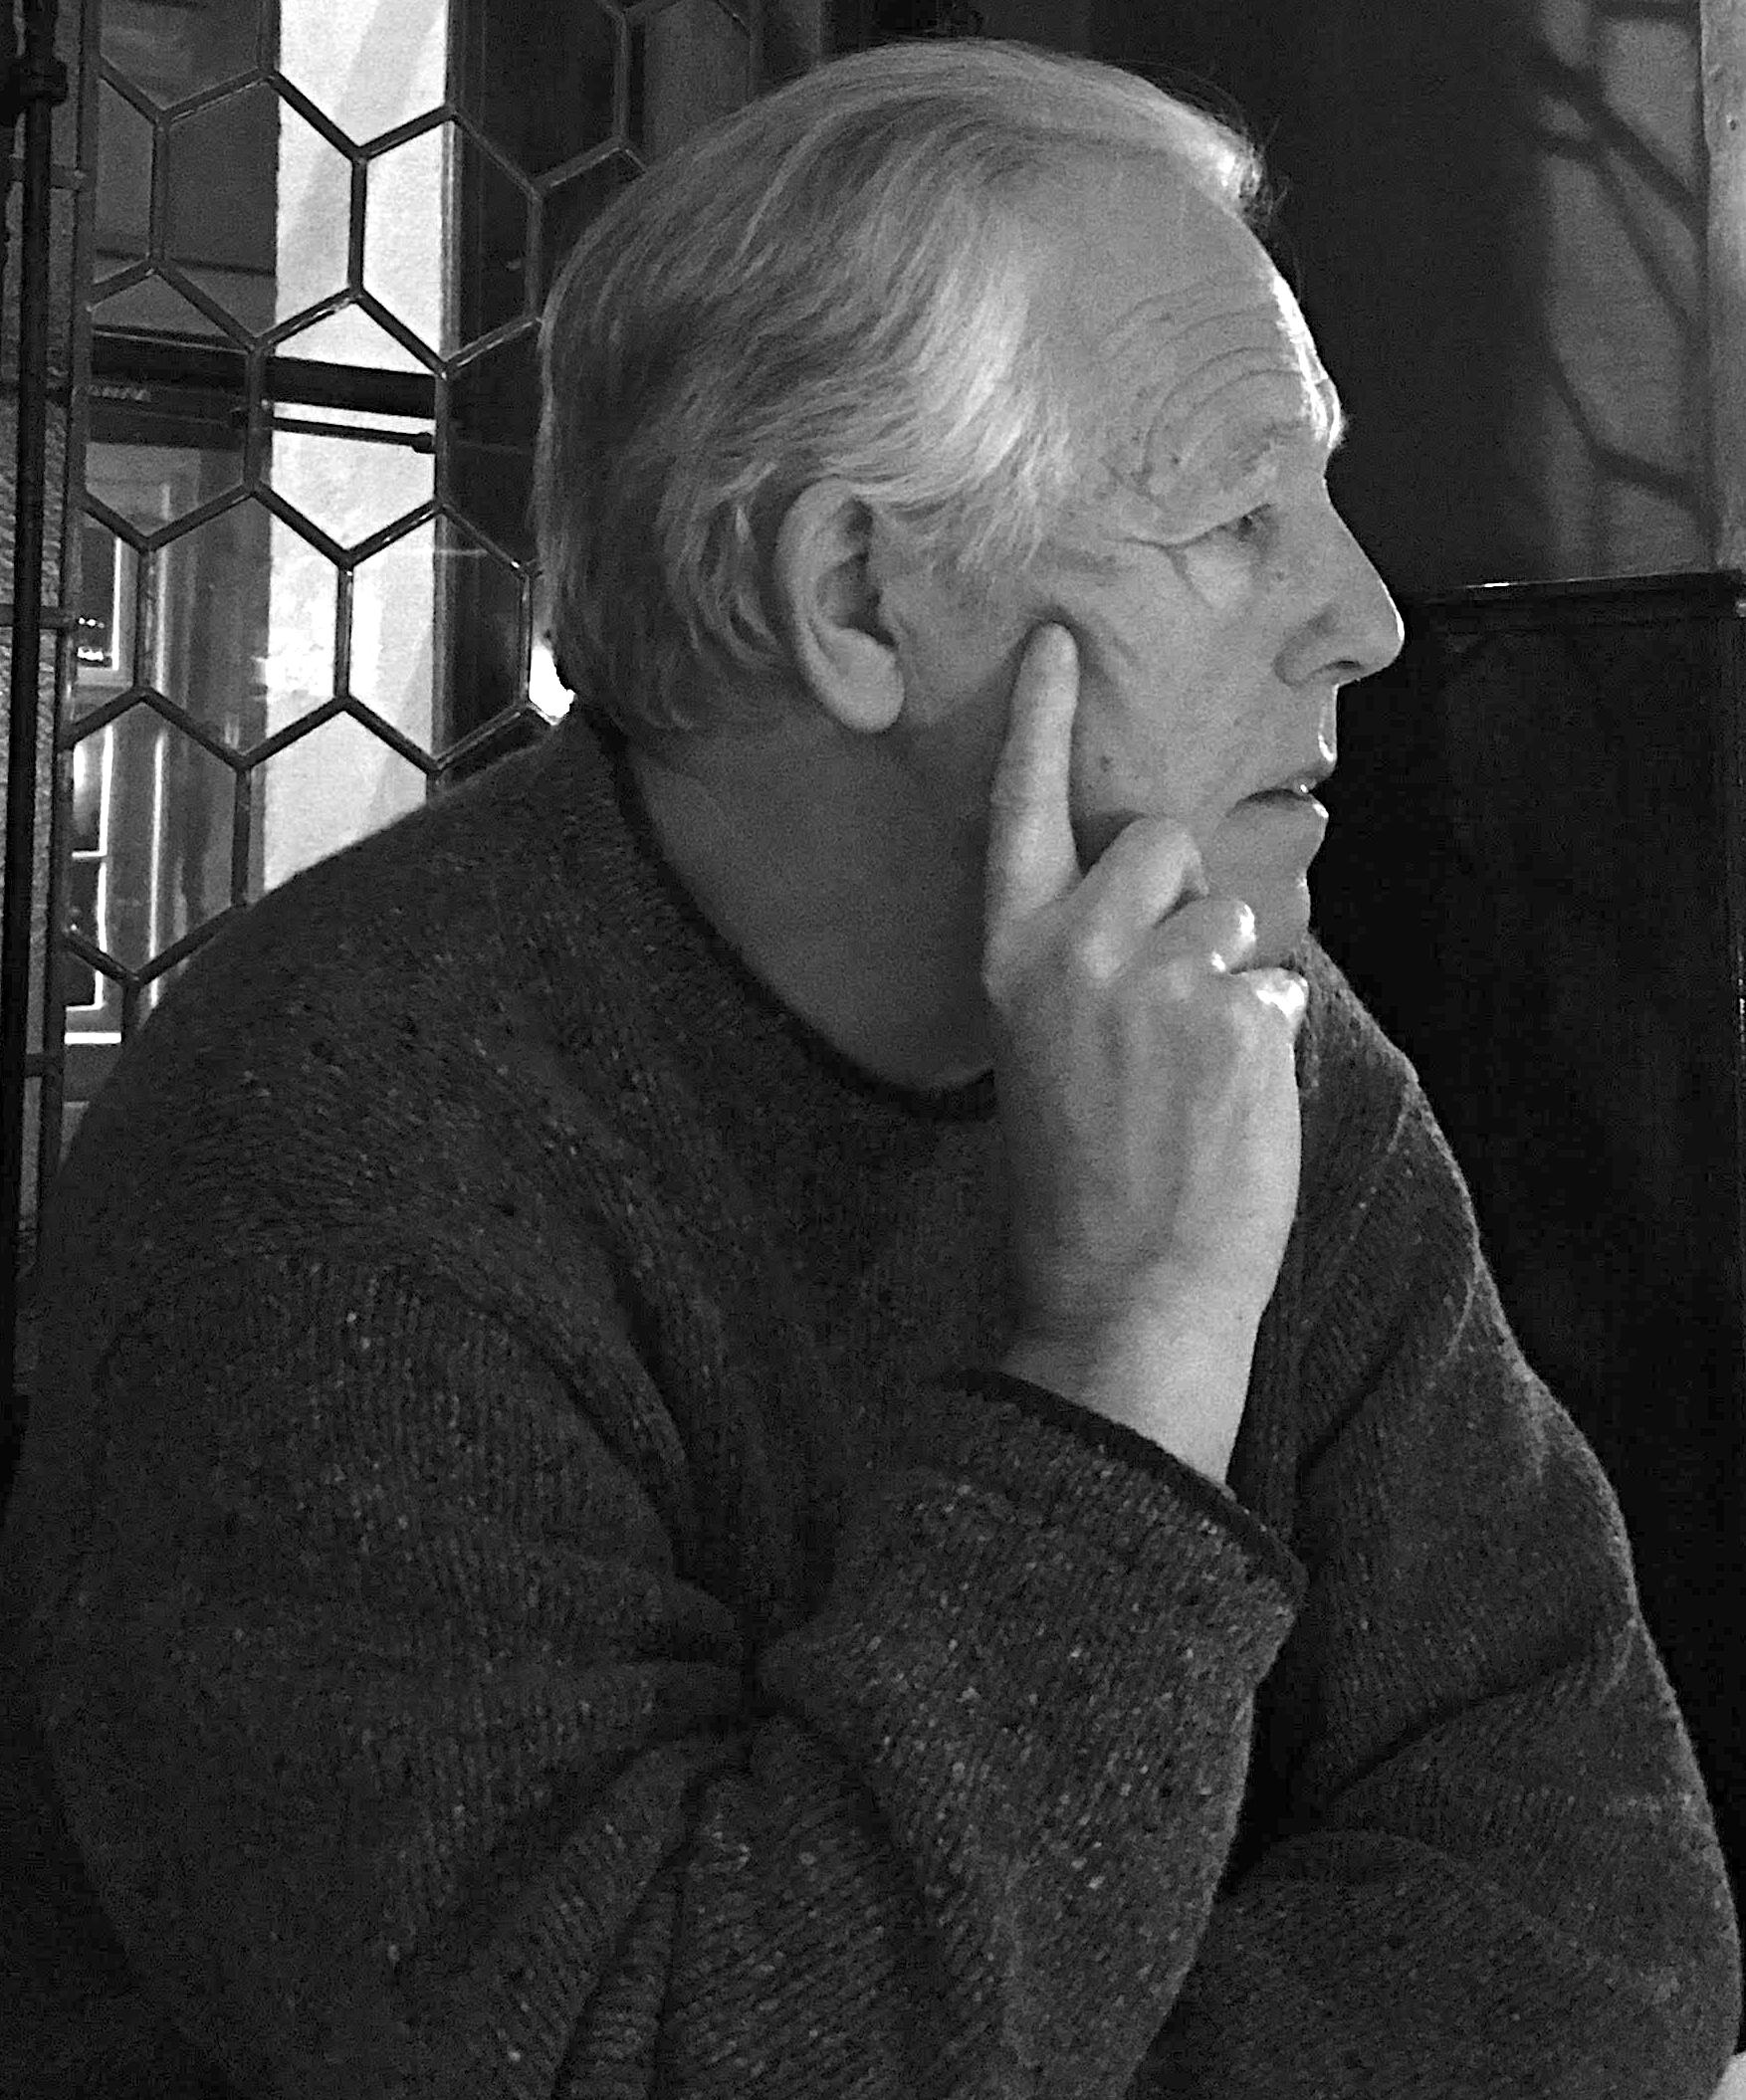 John Brand (20th century)